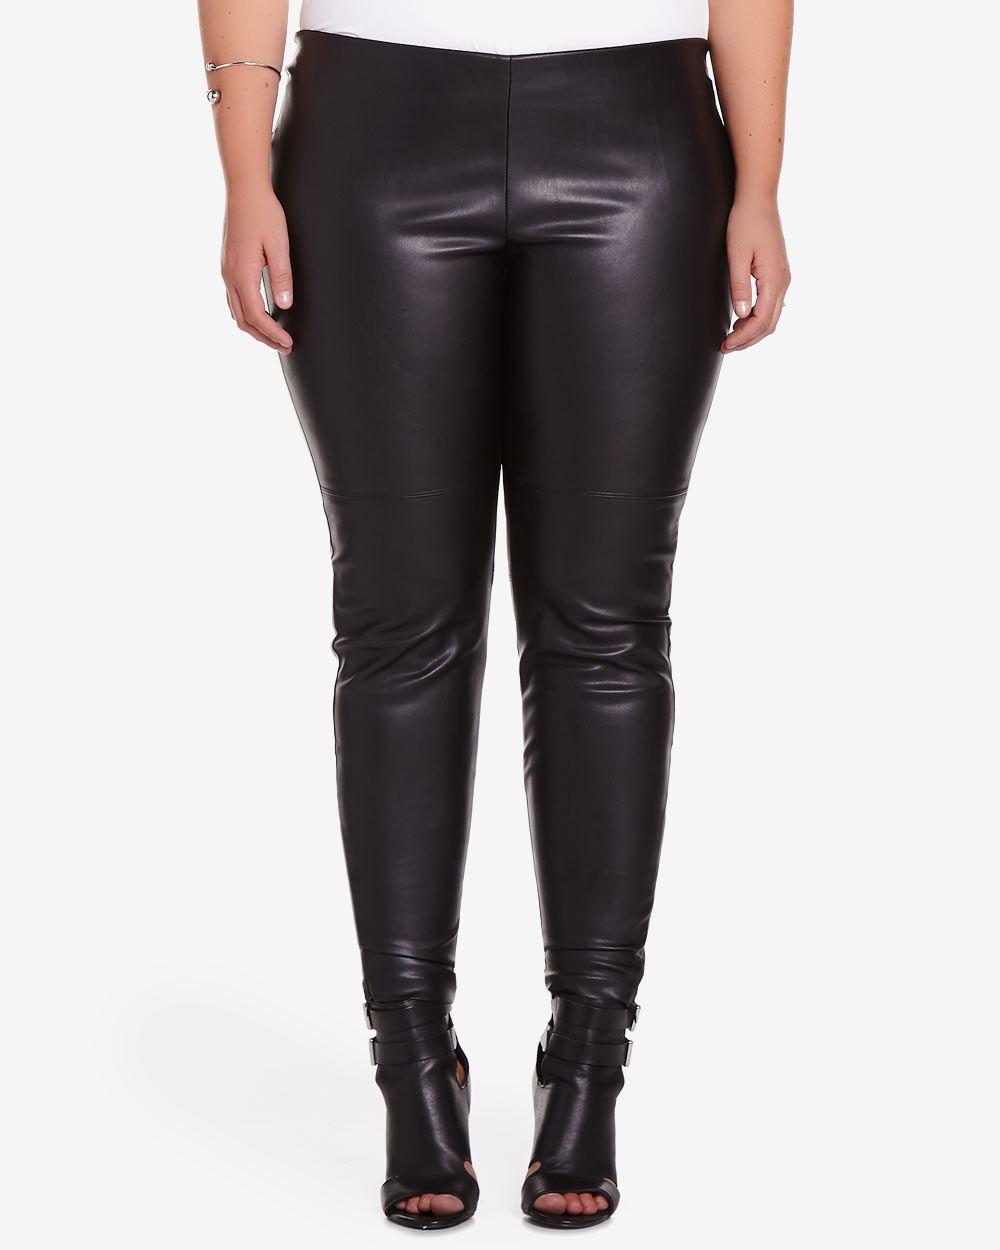 Plus Size Faux Leather Leggings | Plus Sizes | Reitmans